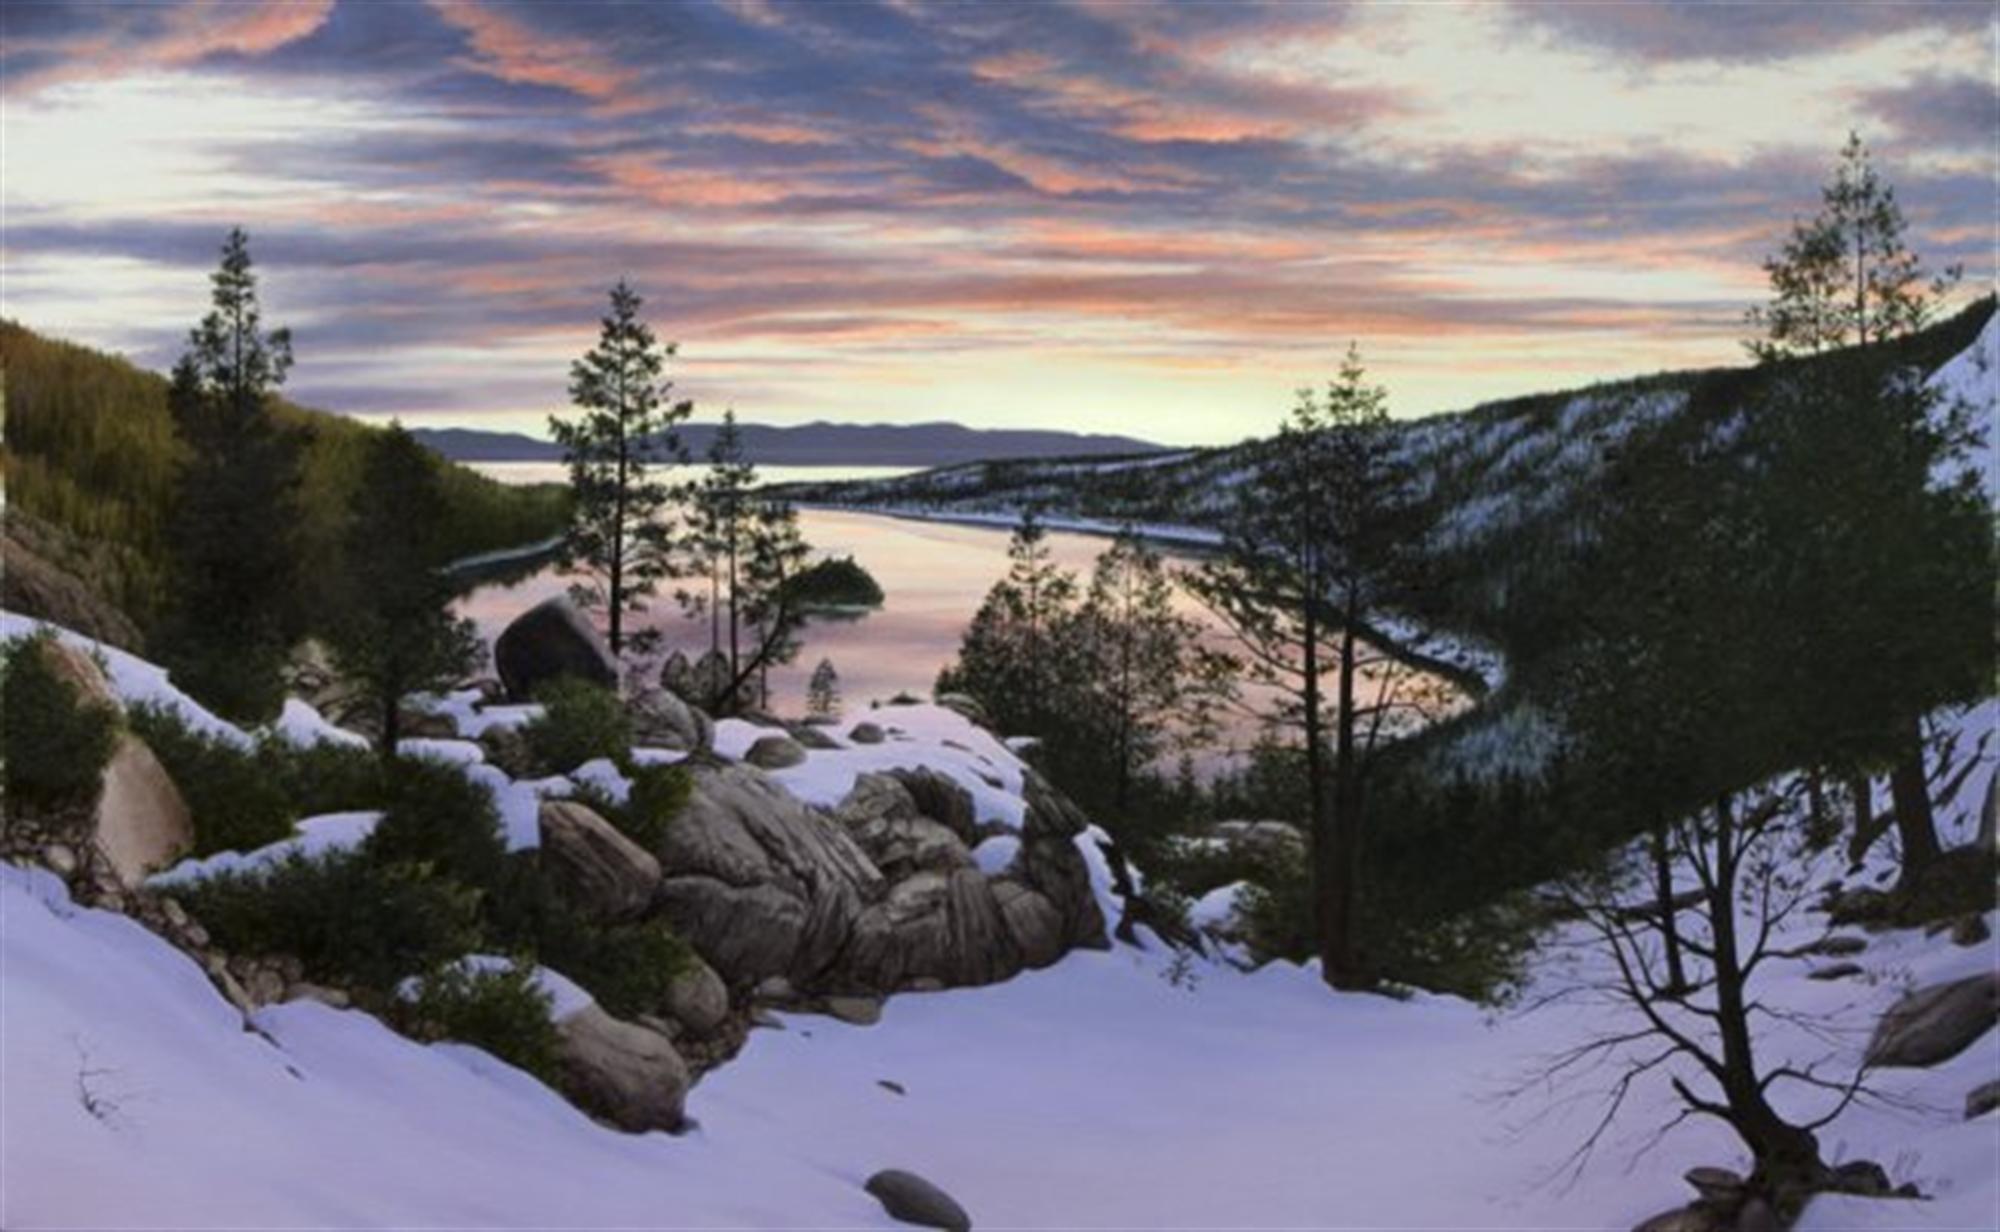 Emerald Bay Sunrise by Alexander Volkov